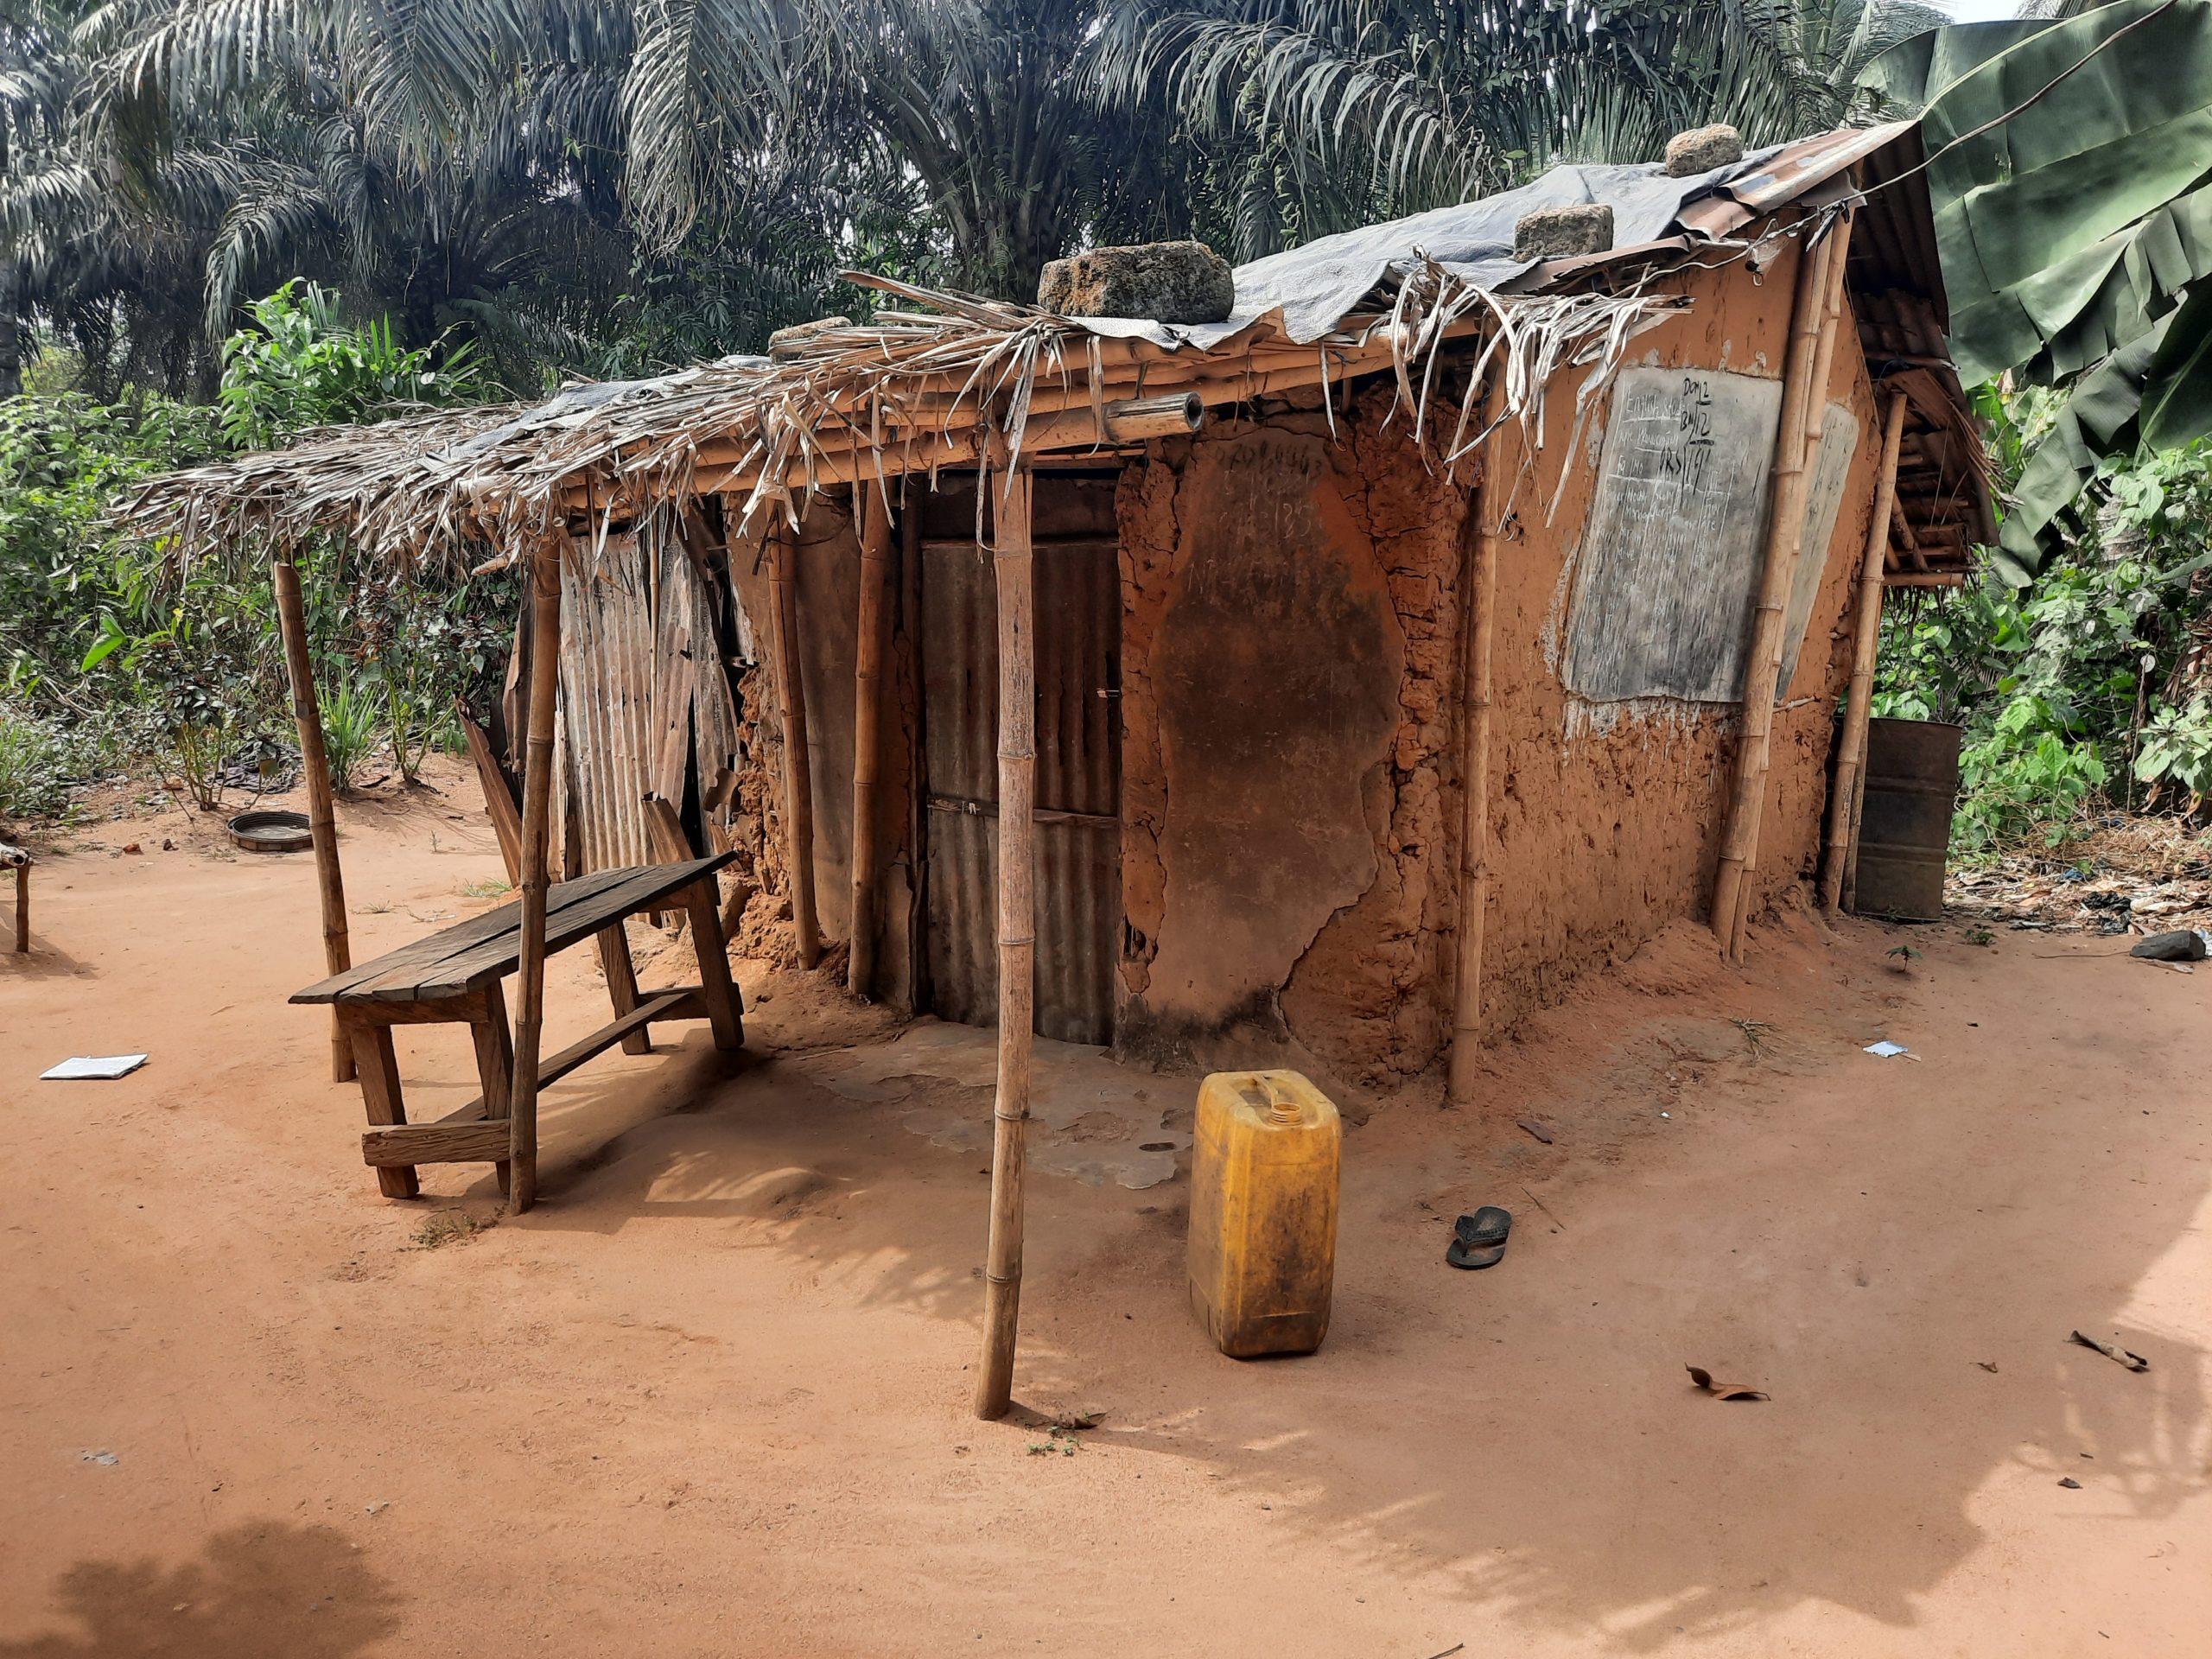 The Agbatuwa's residence